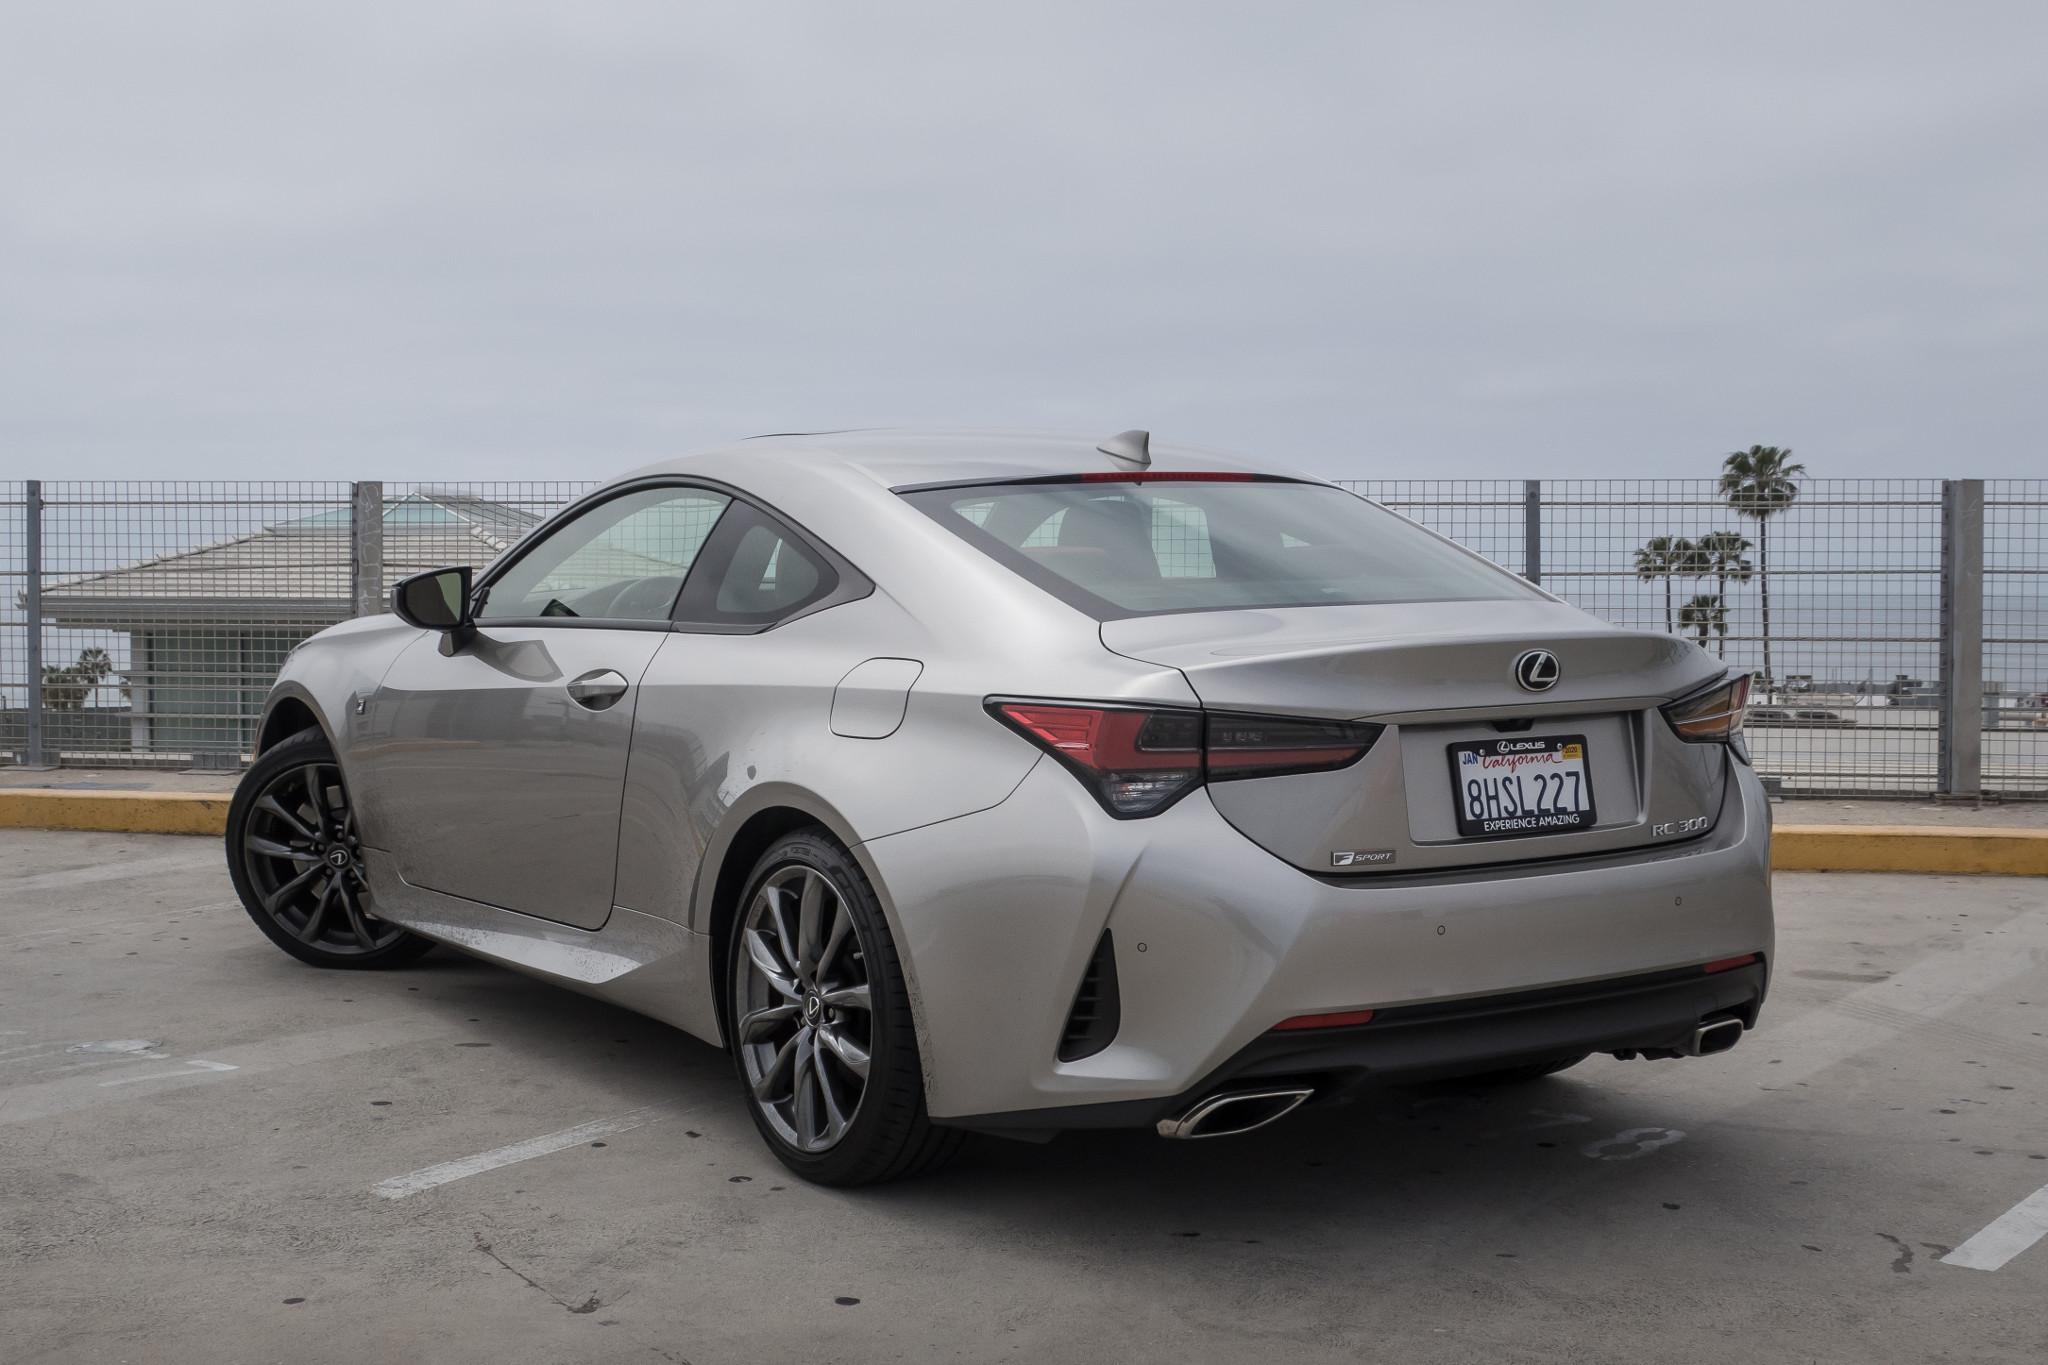 04-lexus-rc-300-f-sport-2019-angle--exterior--rear--silver.jpg